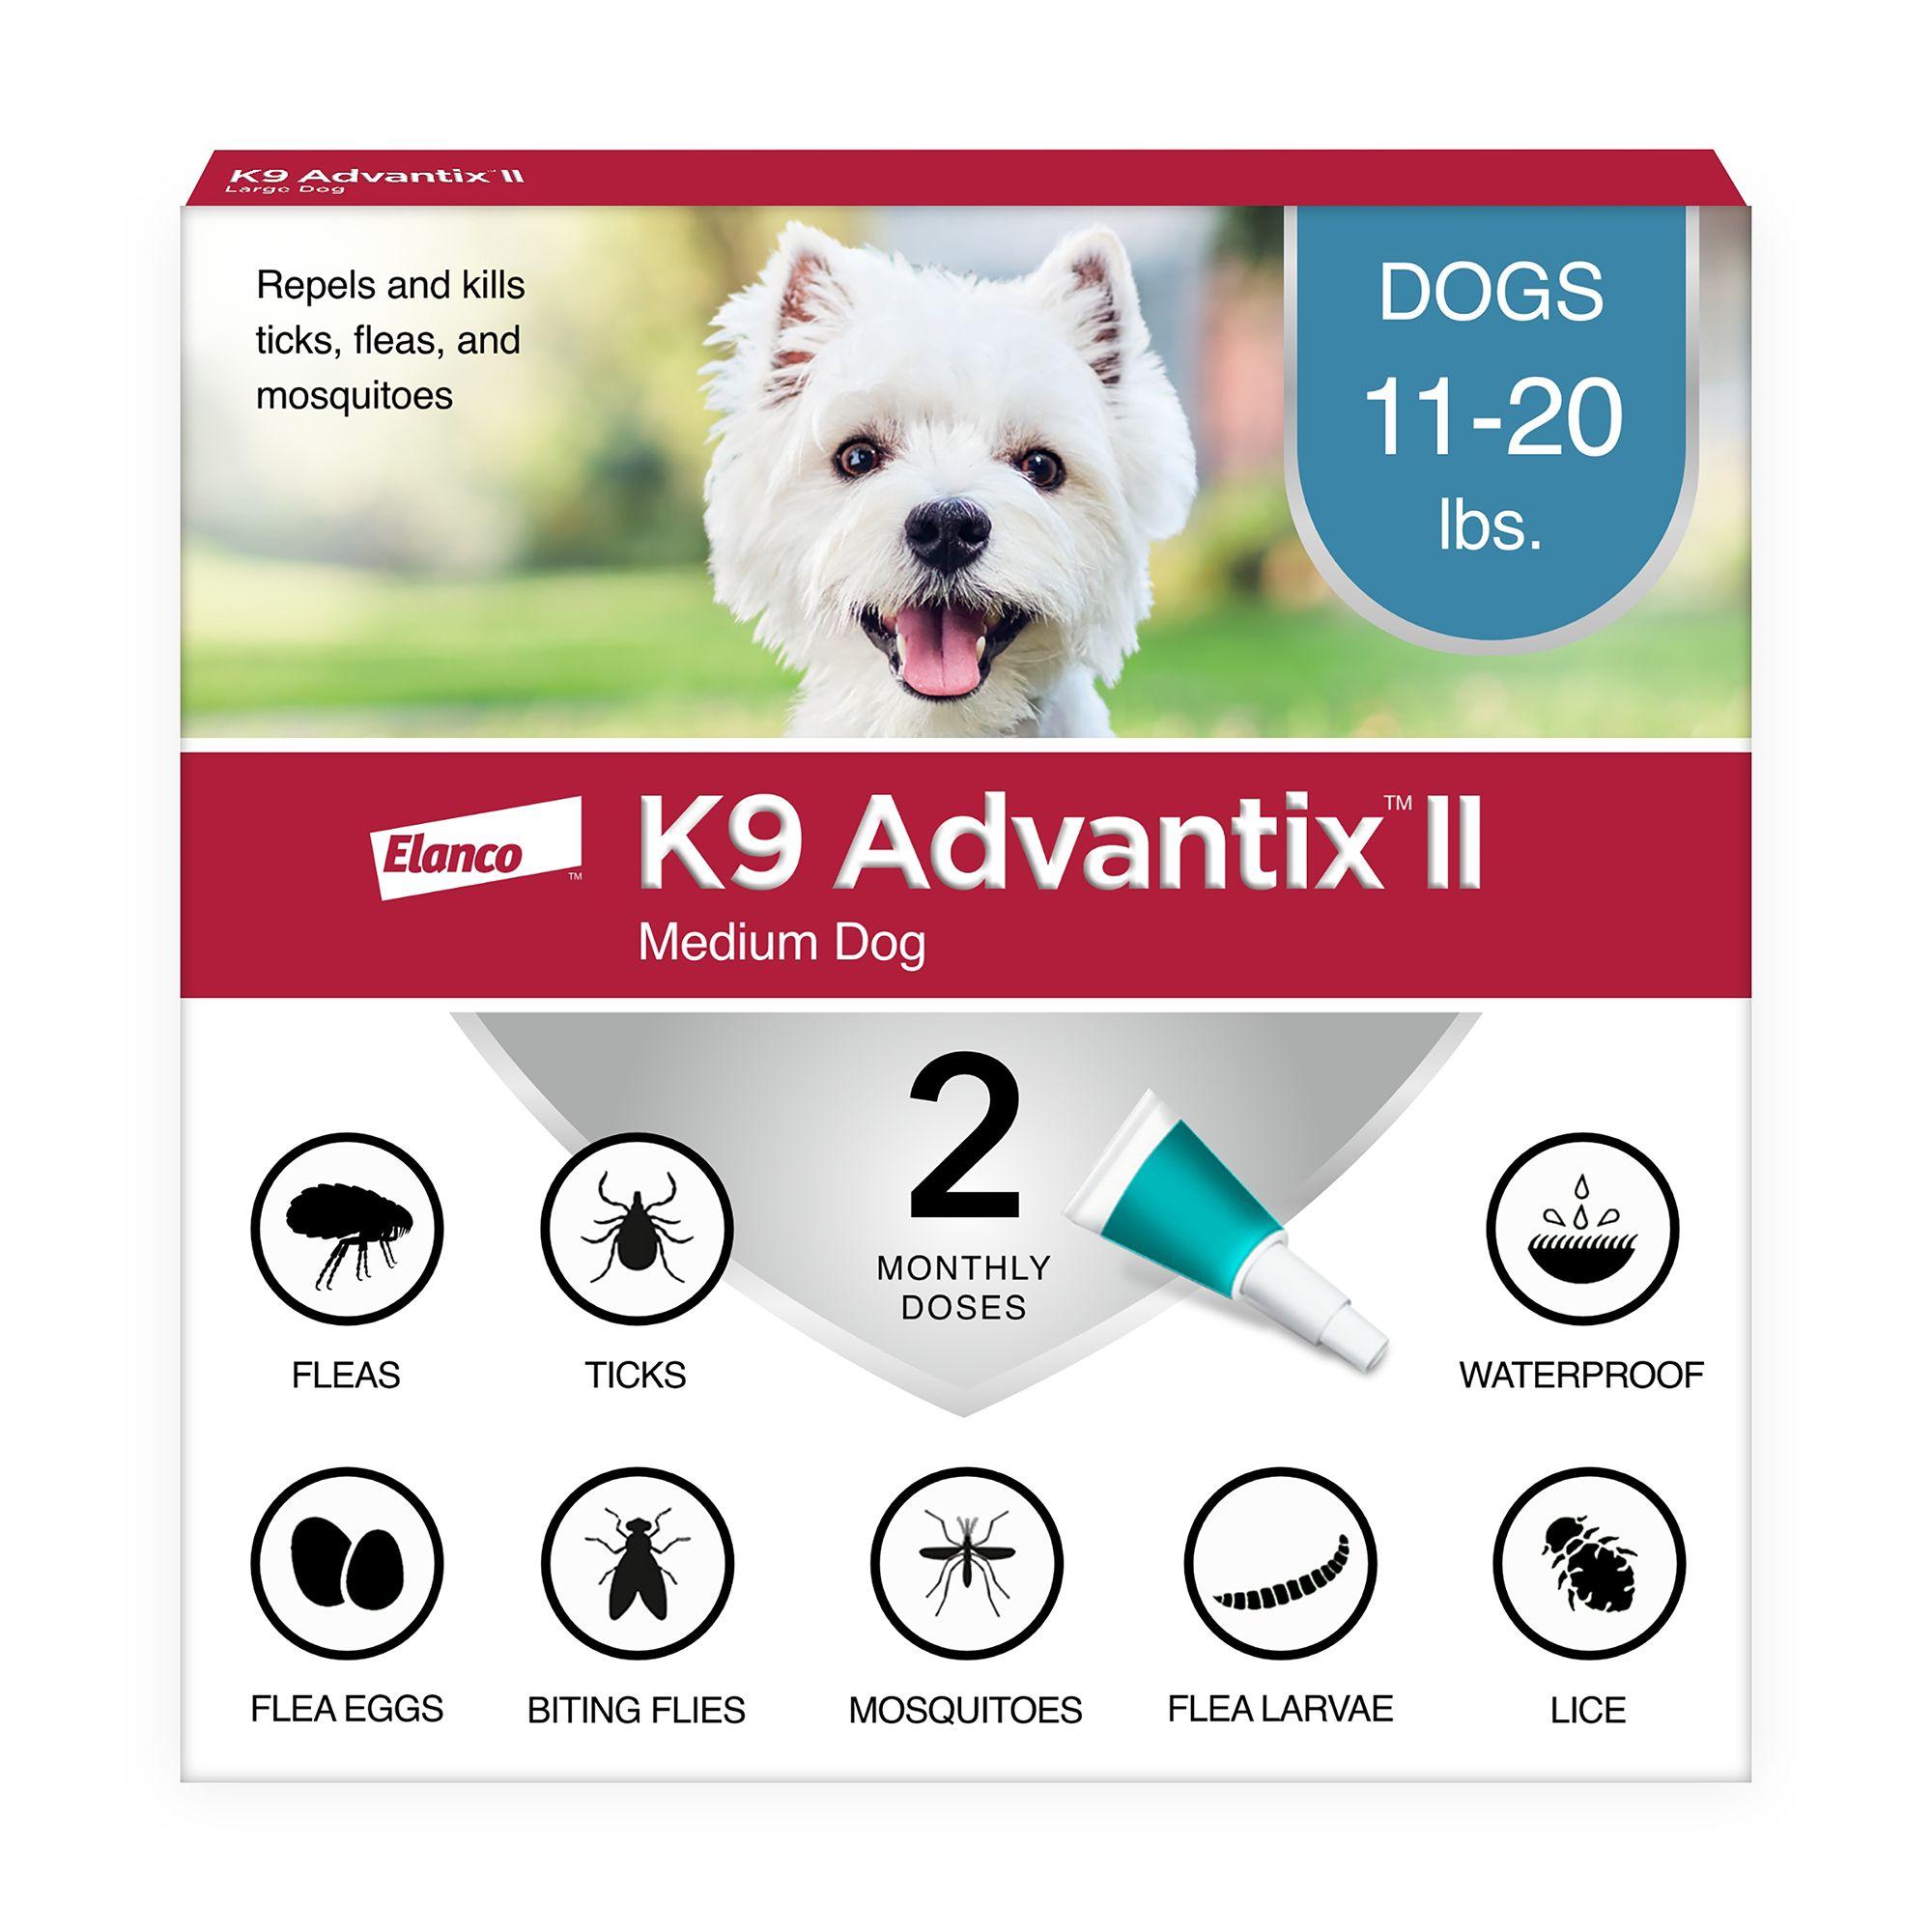 K9 Advantix Ii 11 20 Lbs Dog Flea And Tick Treatment Size 2 Count